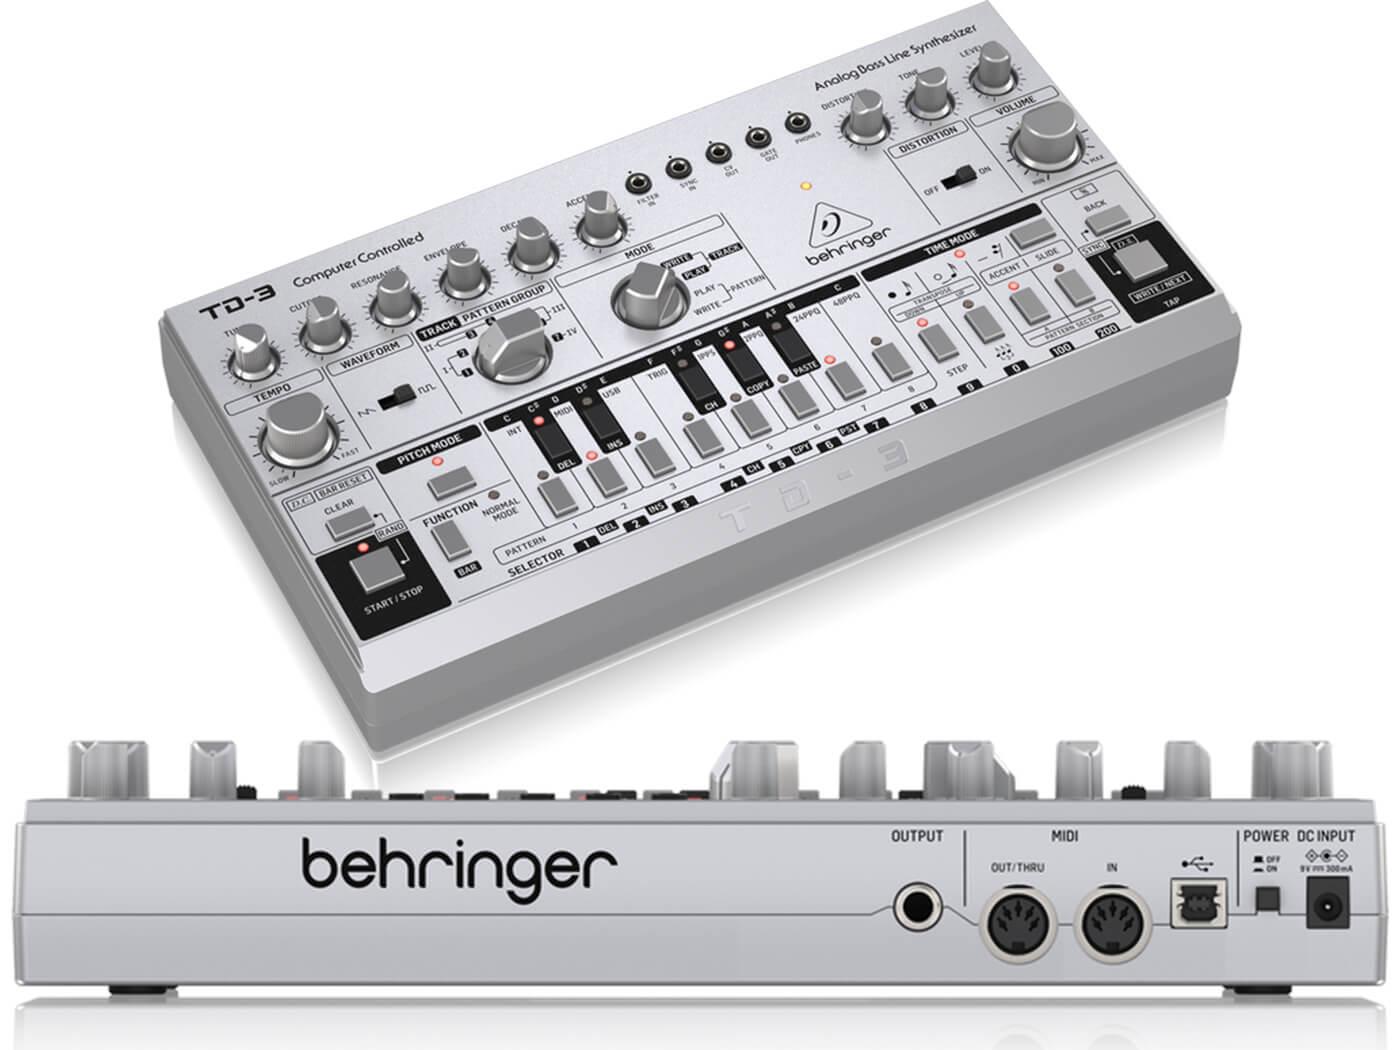 Behringer TD-3 leak